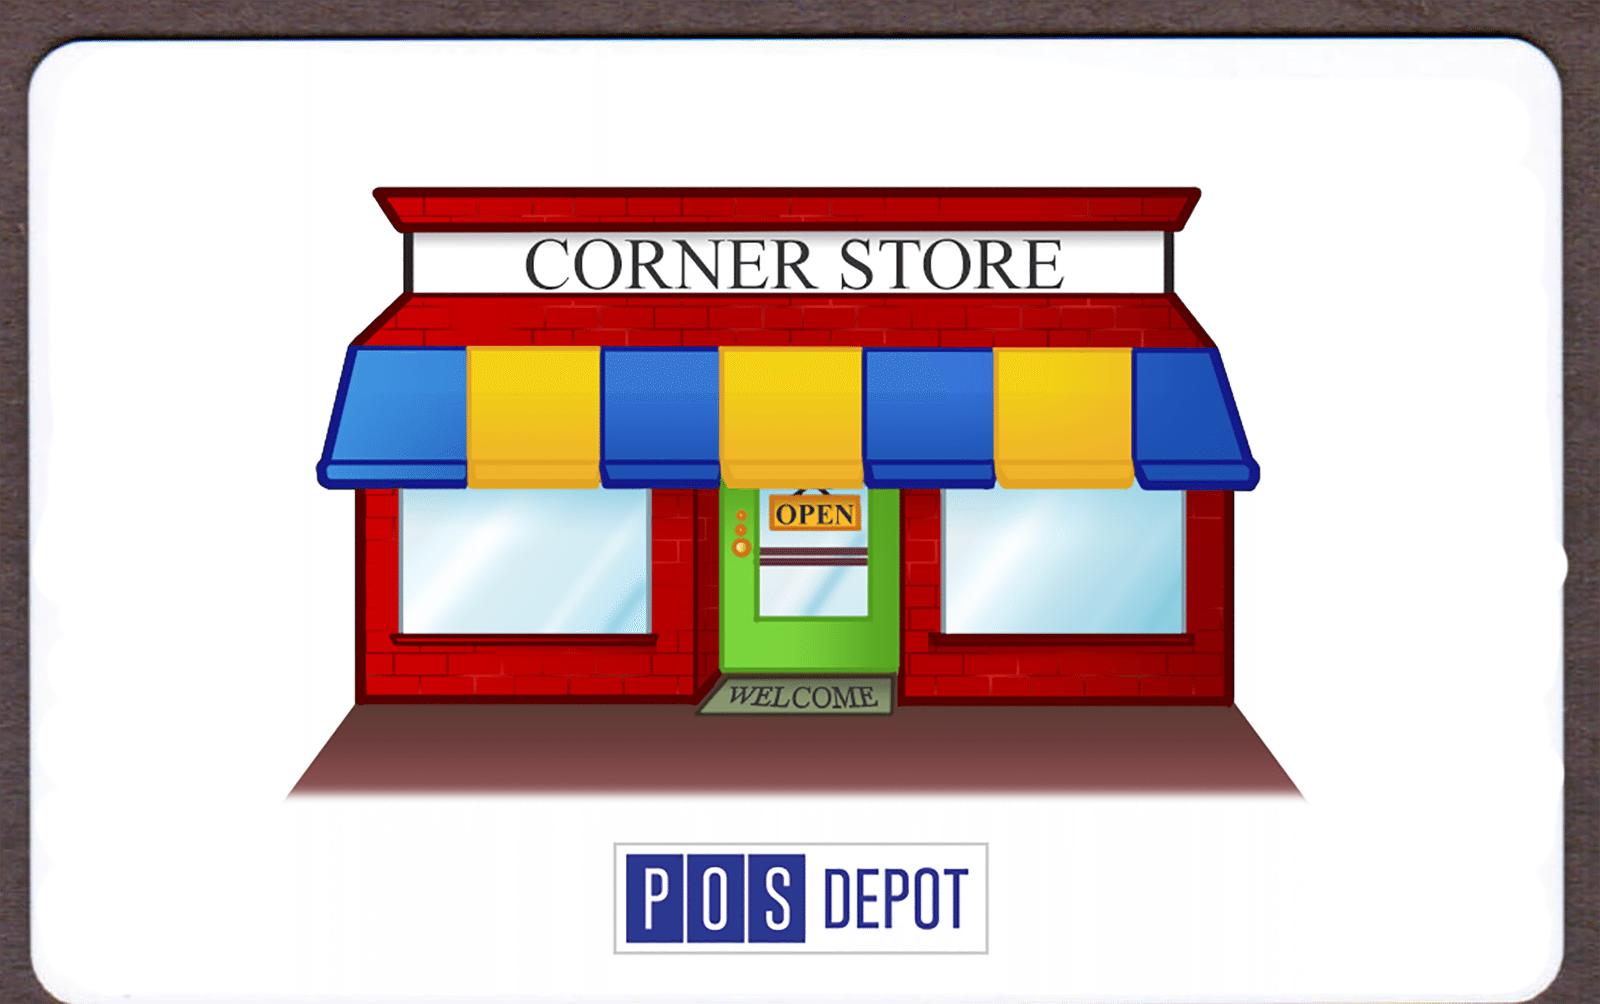 Pc America Corner Store Pos Employee Id Server Swipe Cards